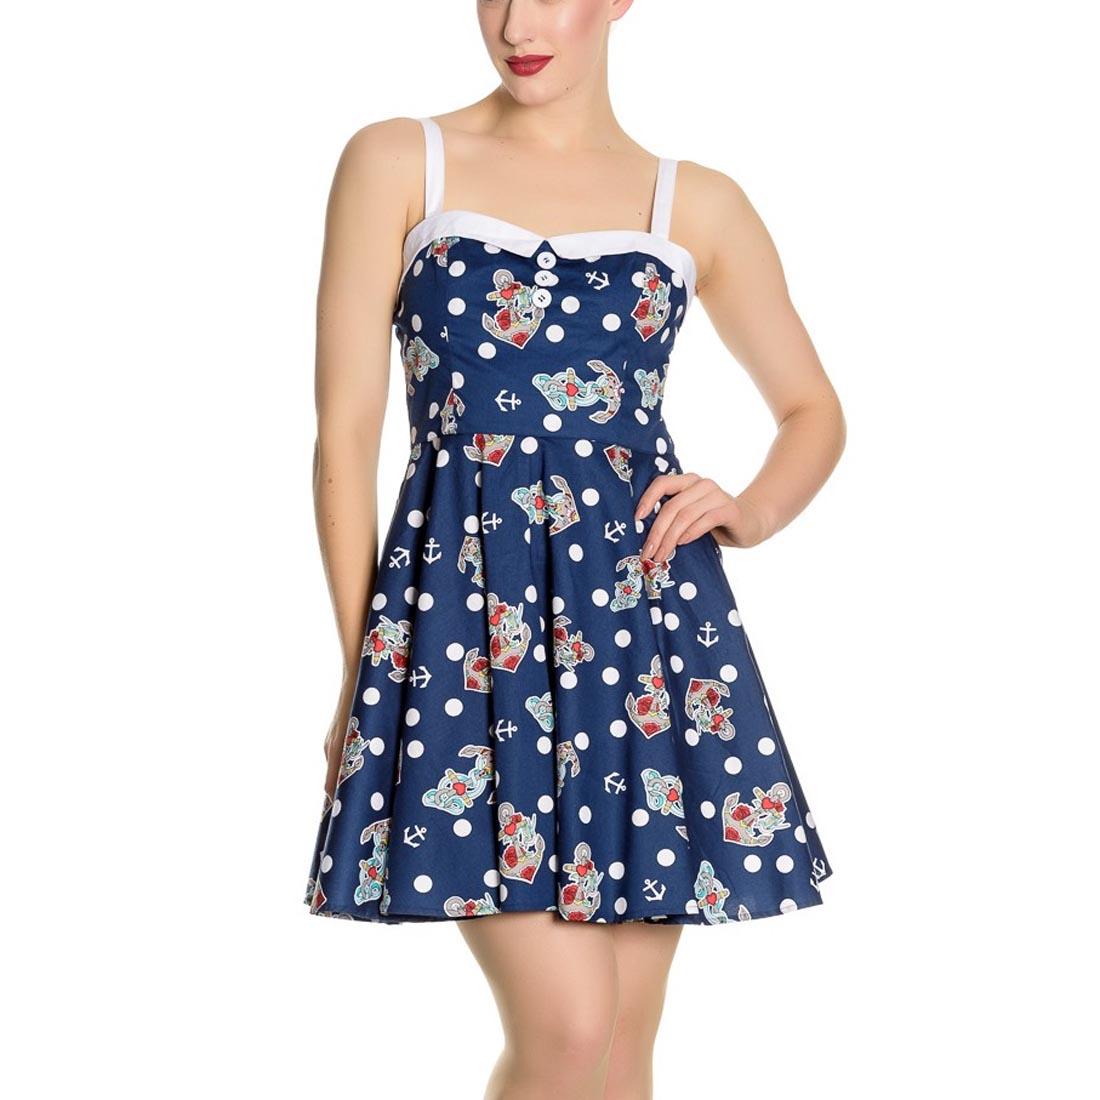 Hell-Bunny-Navy-Blue-50s-Nautical-Mini-Dress-OCEANA-Polka-Dot-All-Sizes thumbnail 27